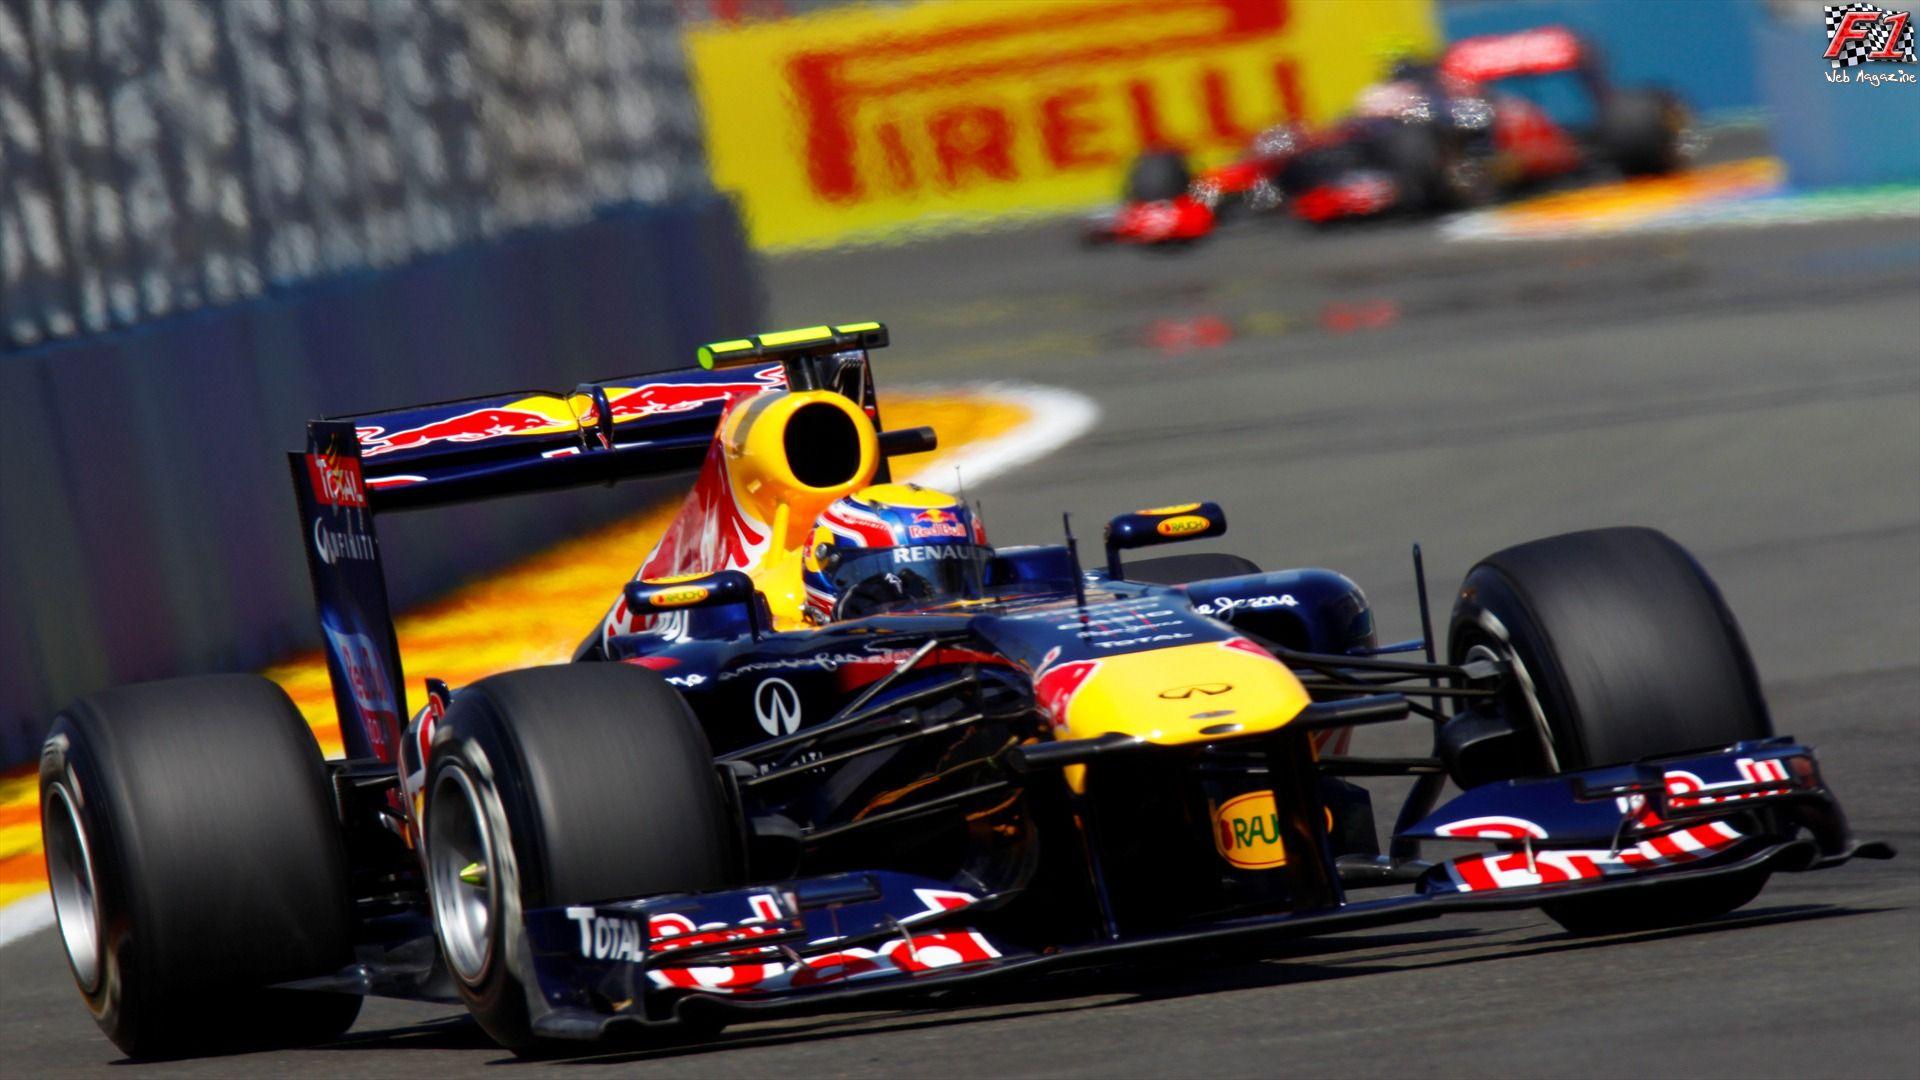 Gp Europa - Qualifiche - CS Pirelli